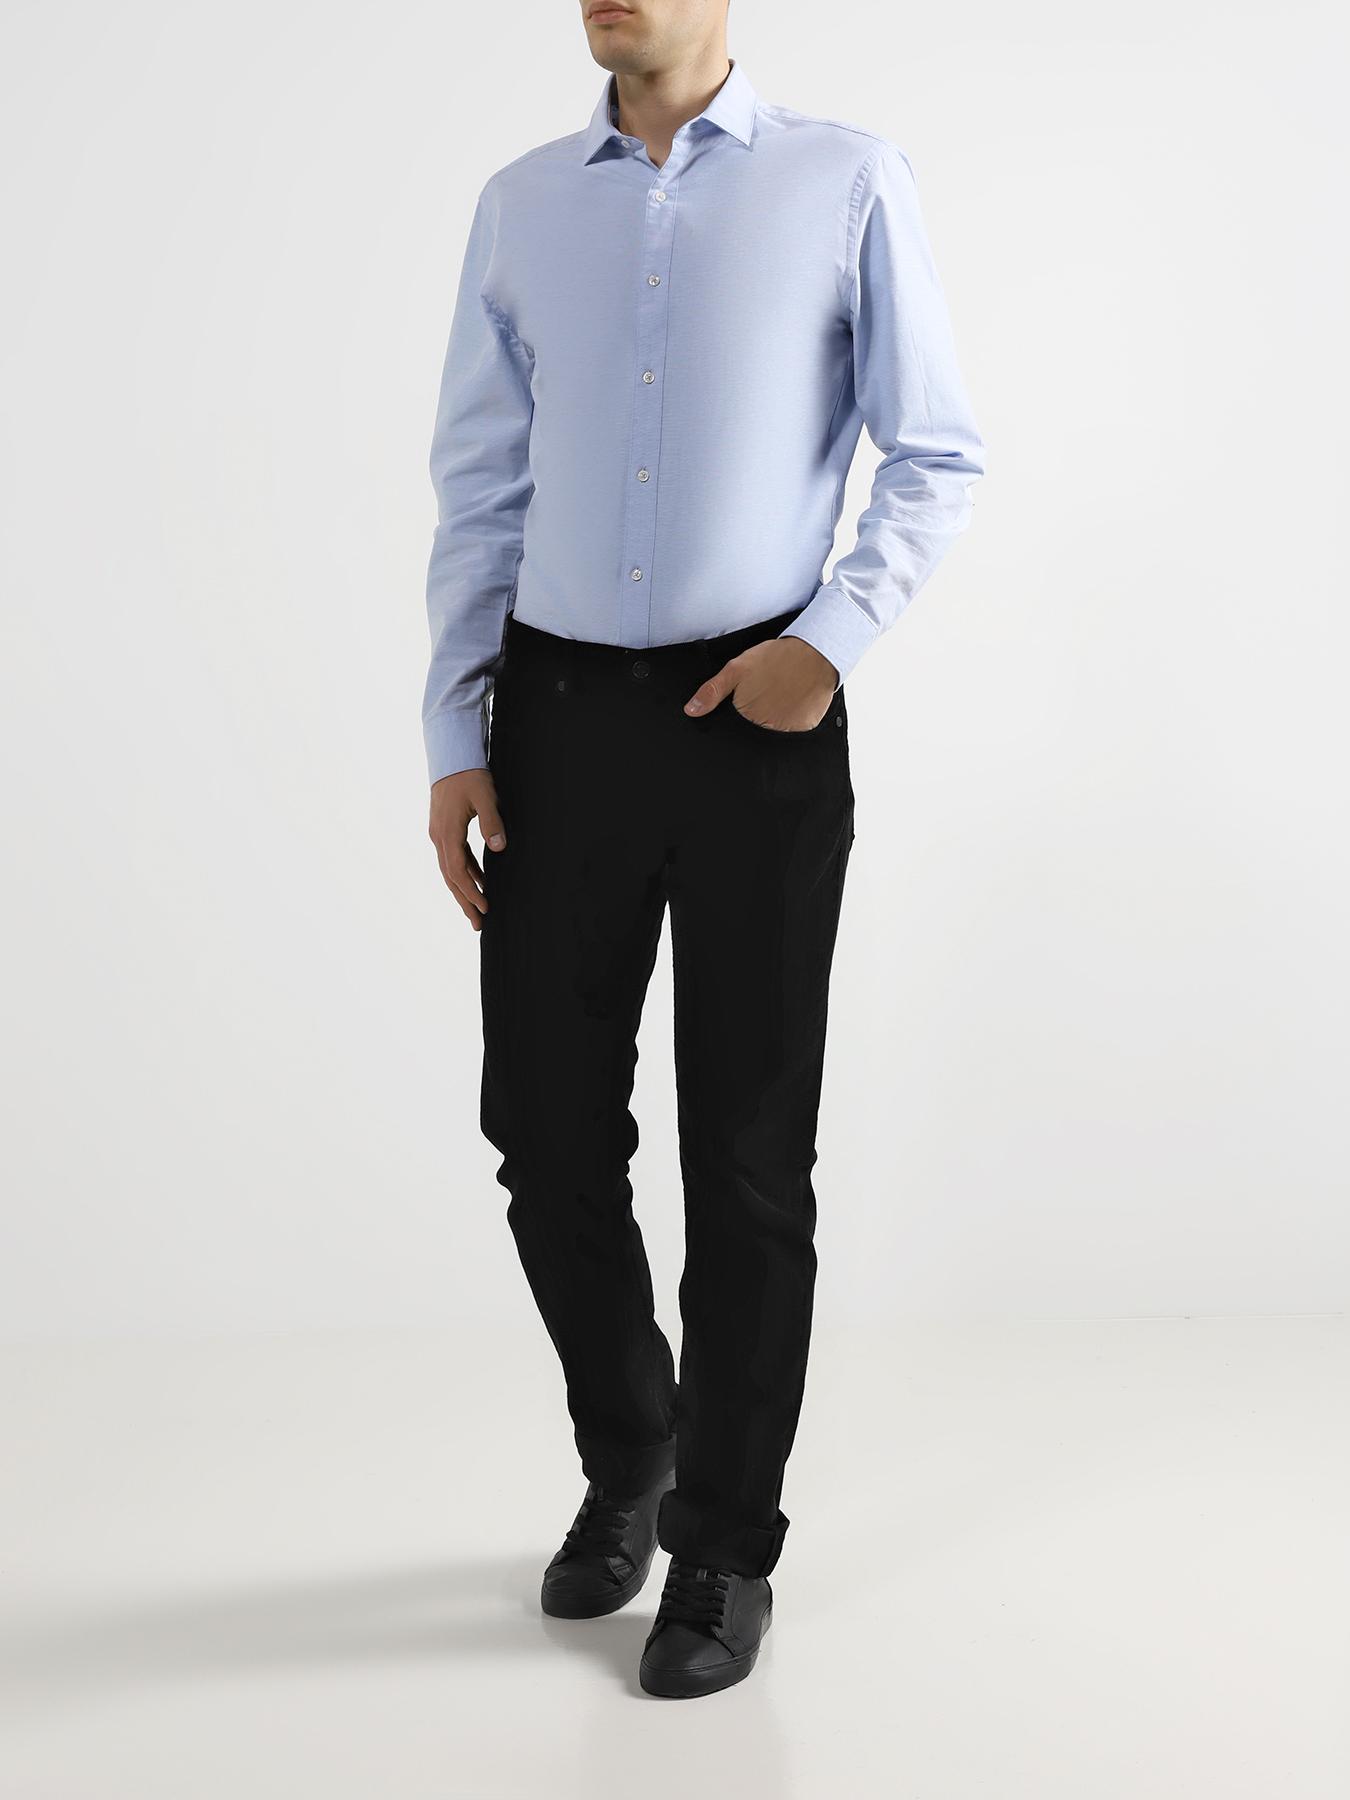 Брюки Baldessarini Мужские брюки